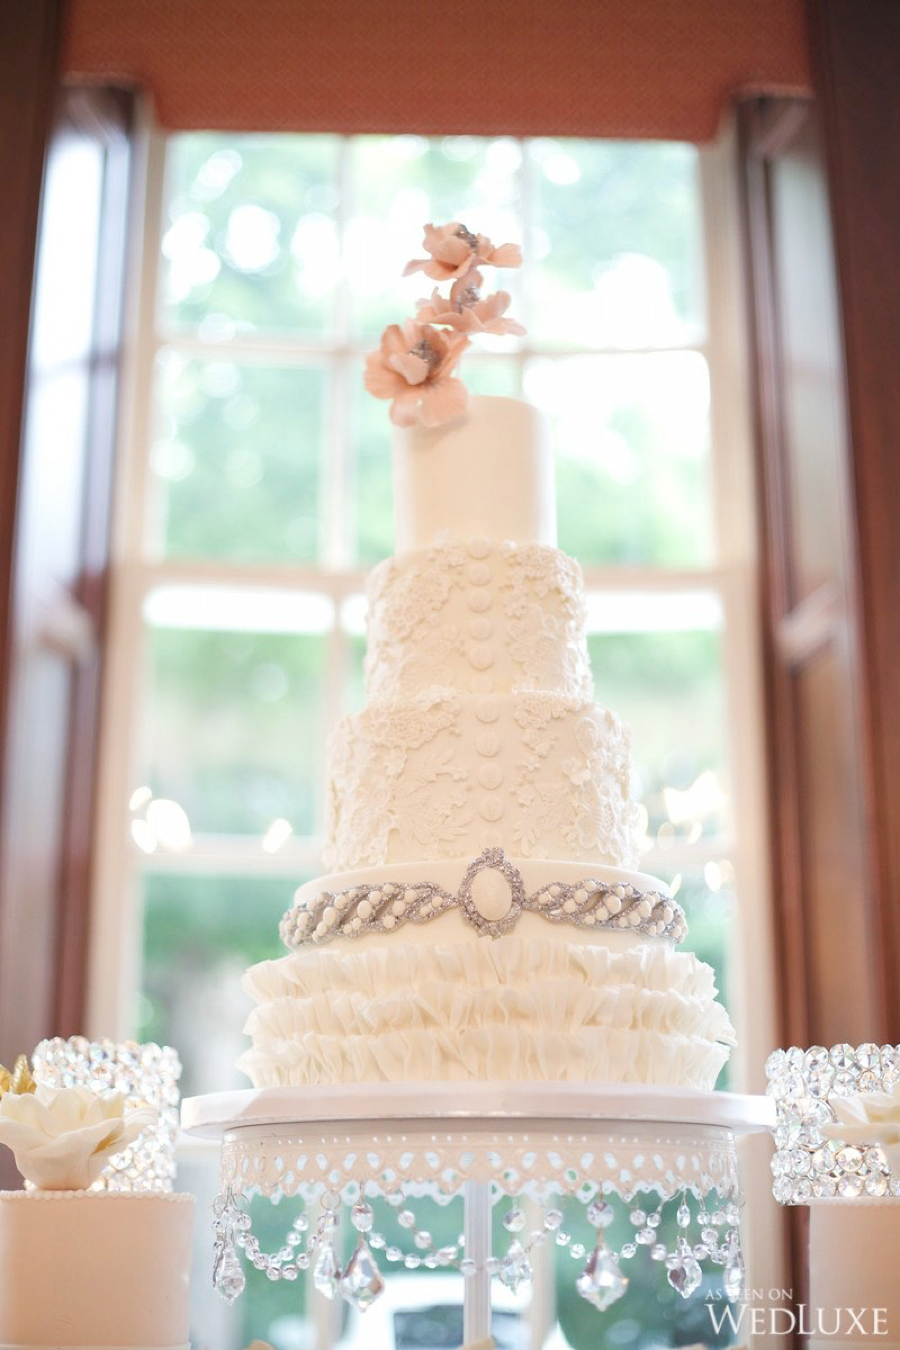 Tiered White Wedding Cake by  Truffle Cake & Pastry  Photo:  Hoyin Siu Photography Studio